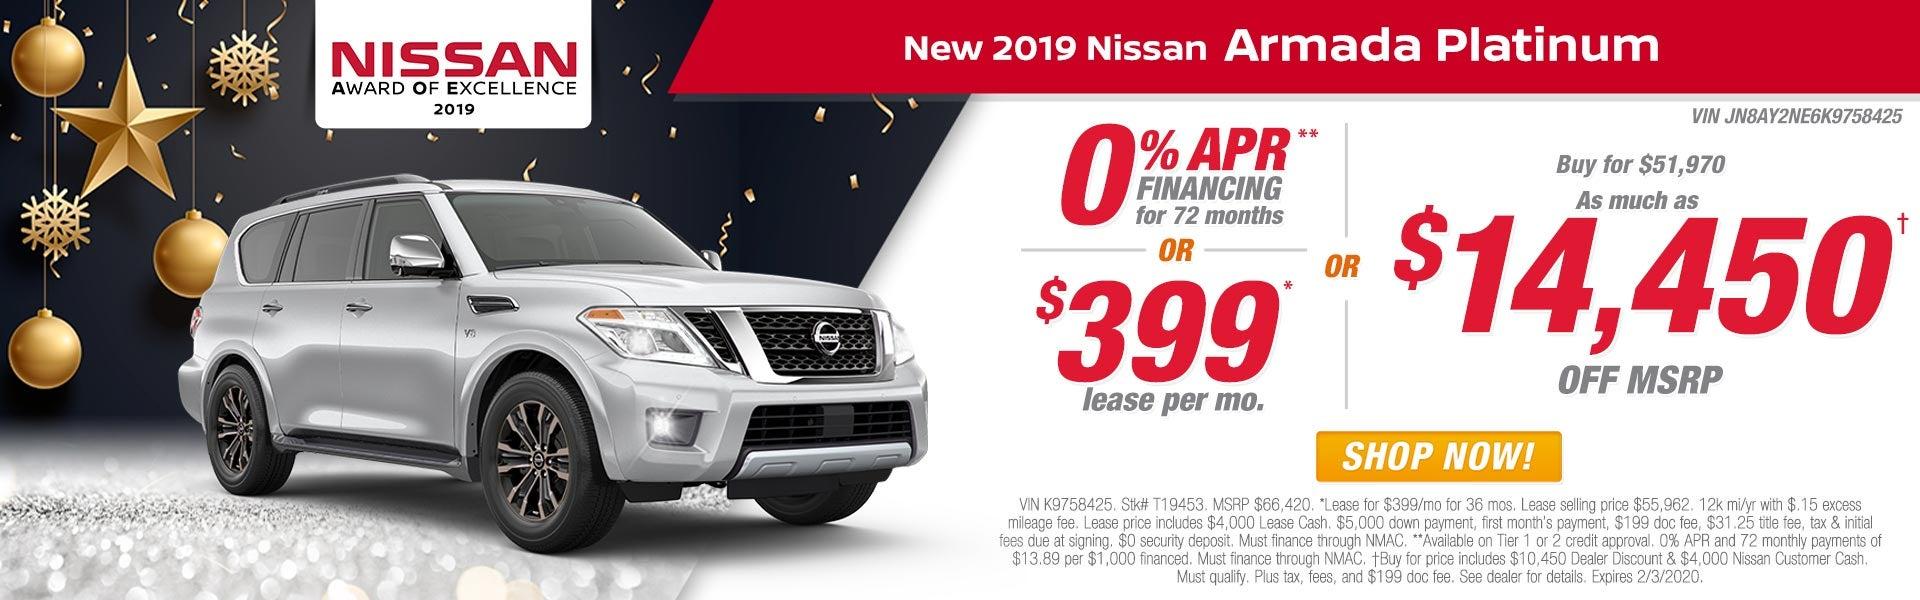 Andy Mohr Nissan Avon >> Nissan Dealer In Indiana Andy Mohr Avon Nissan